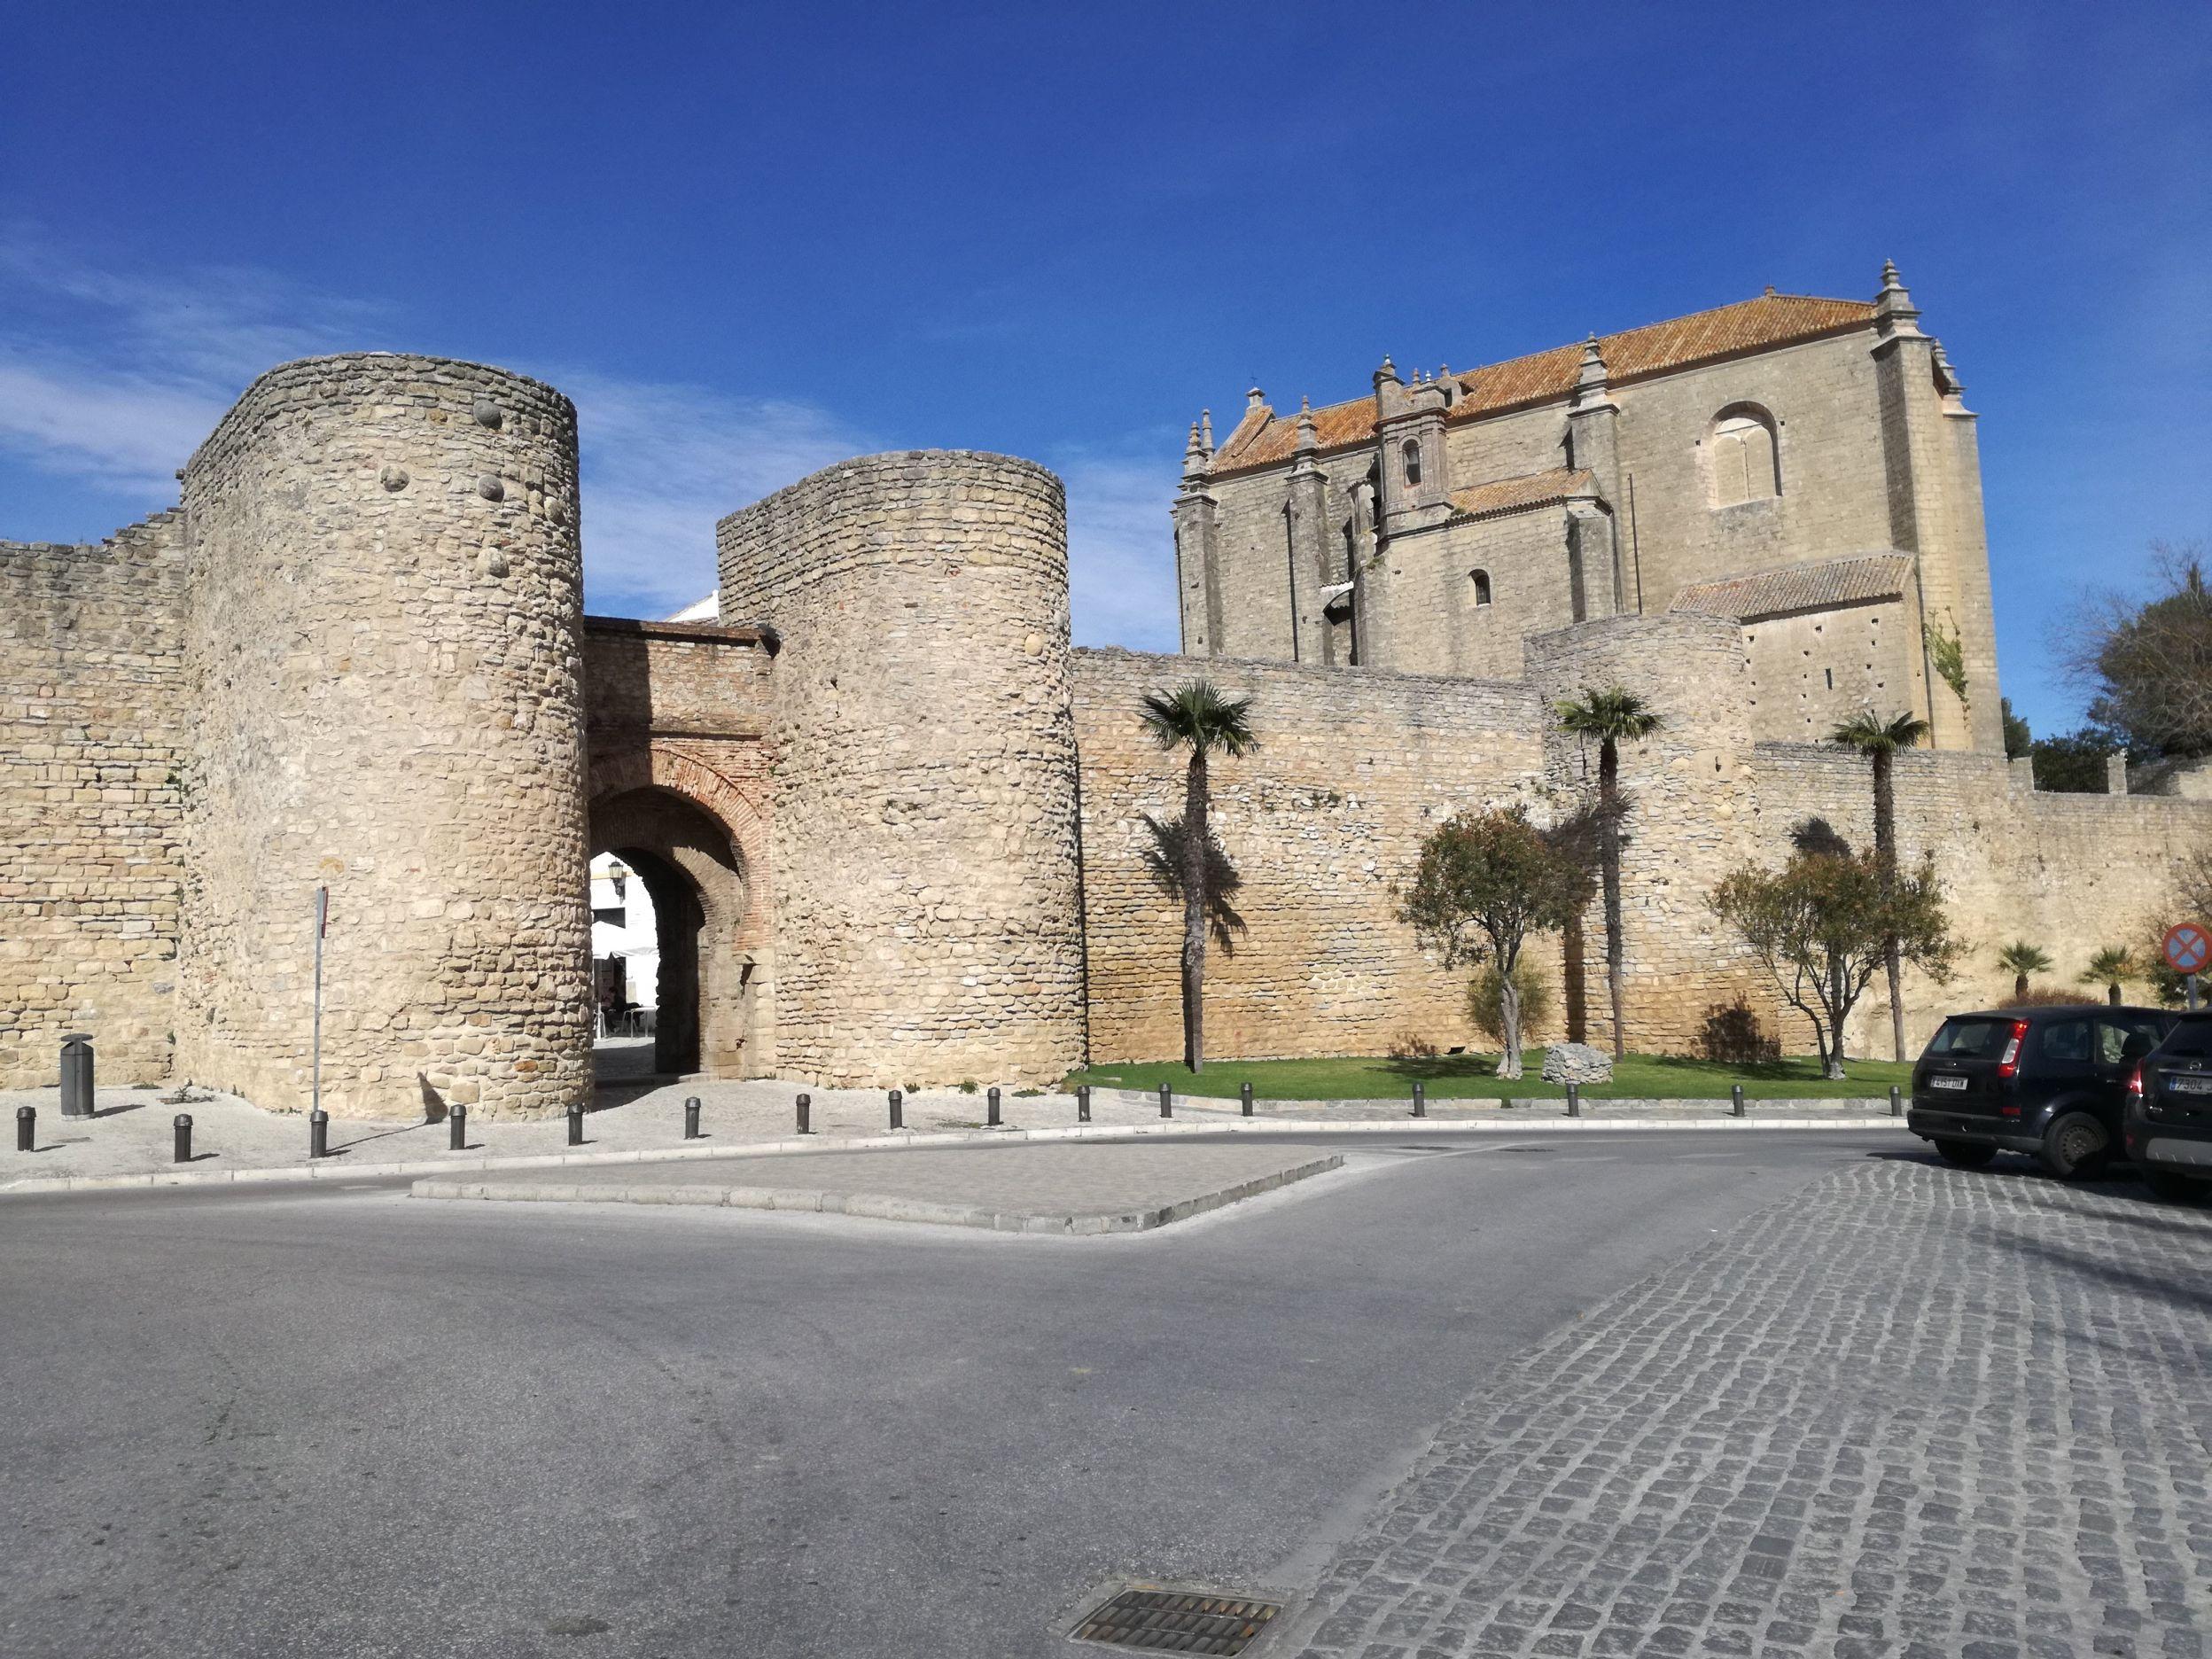 Puerta del Almocabar